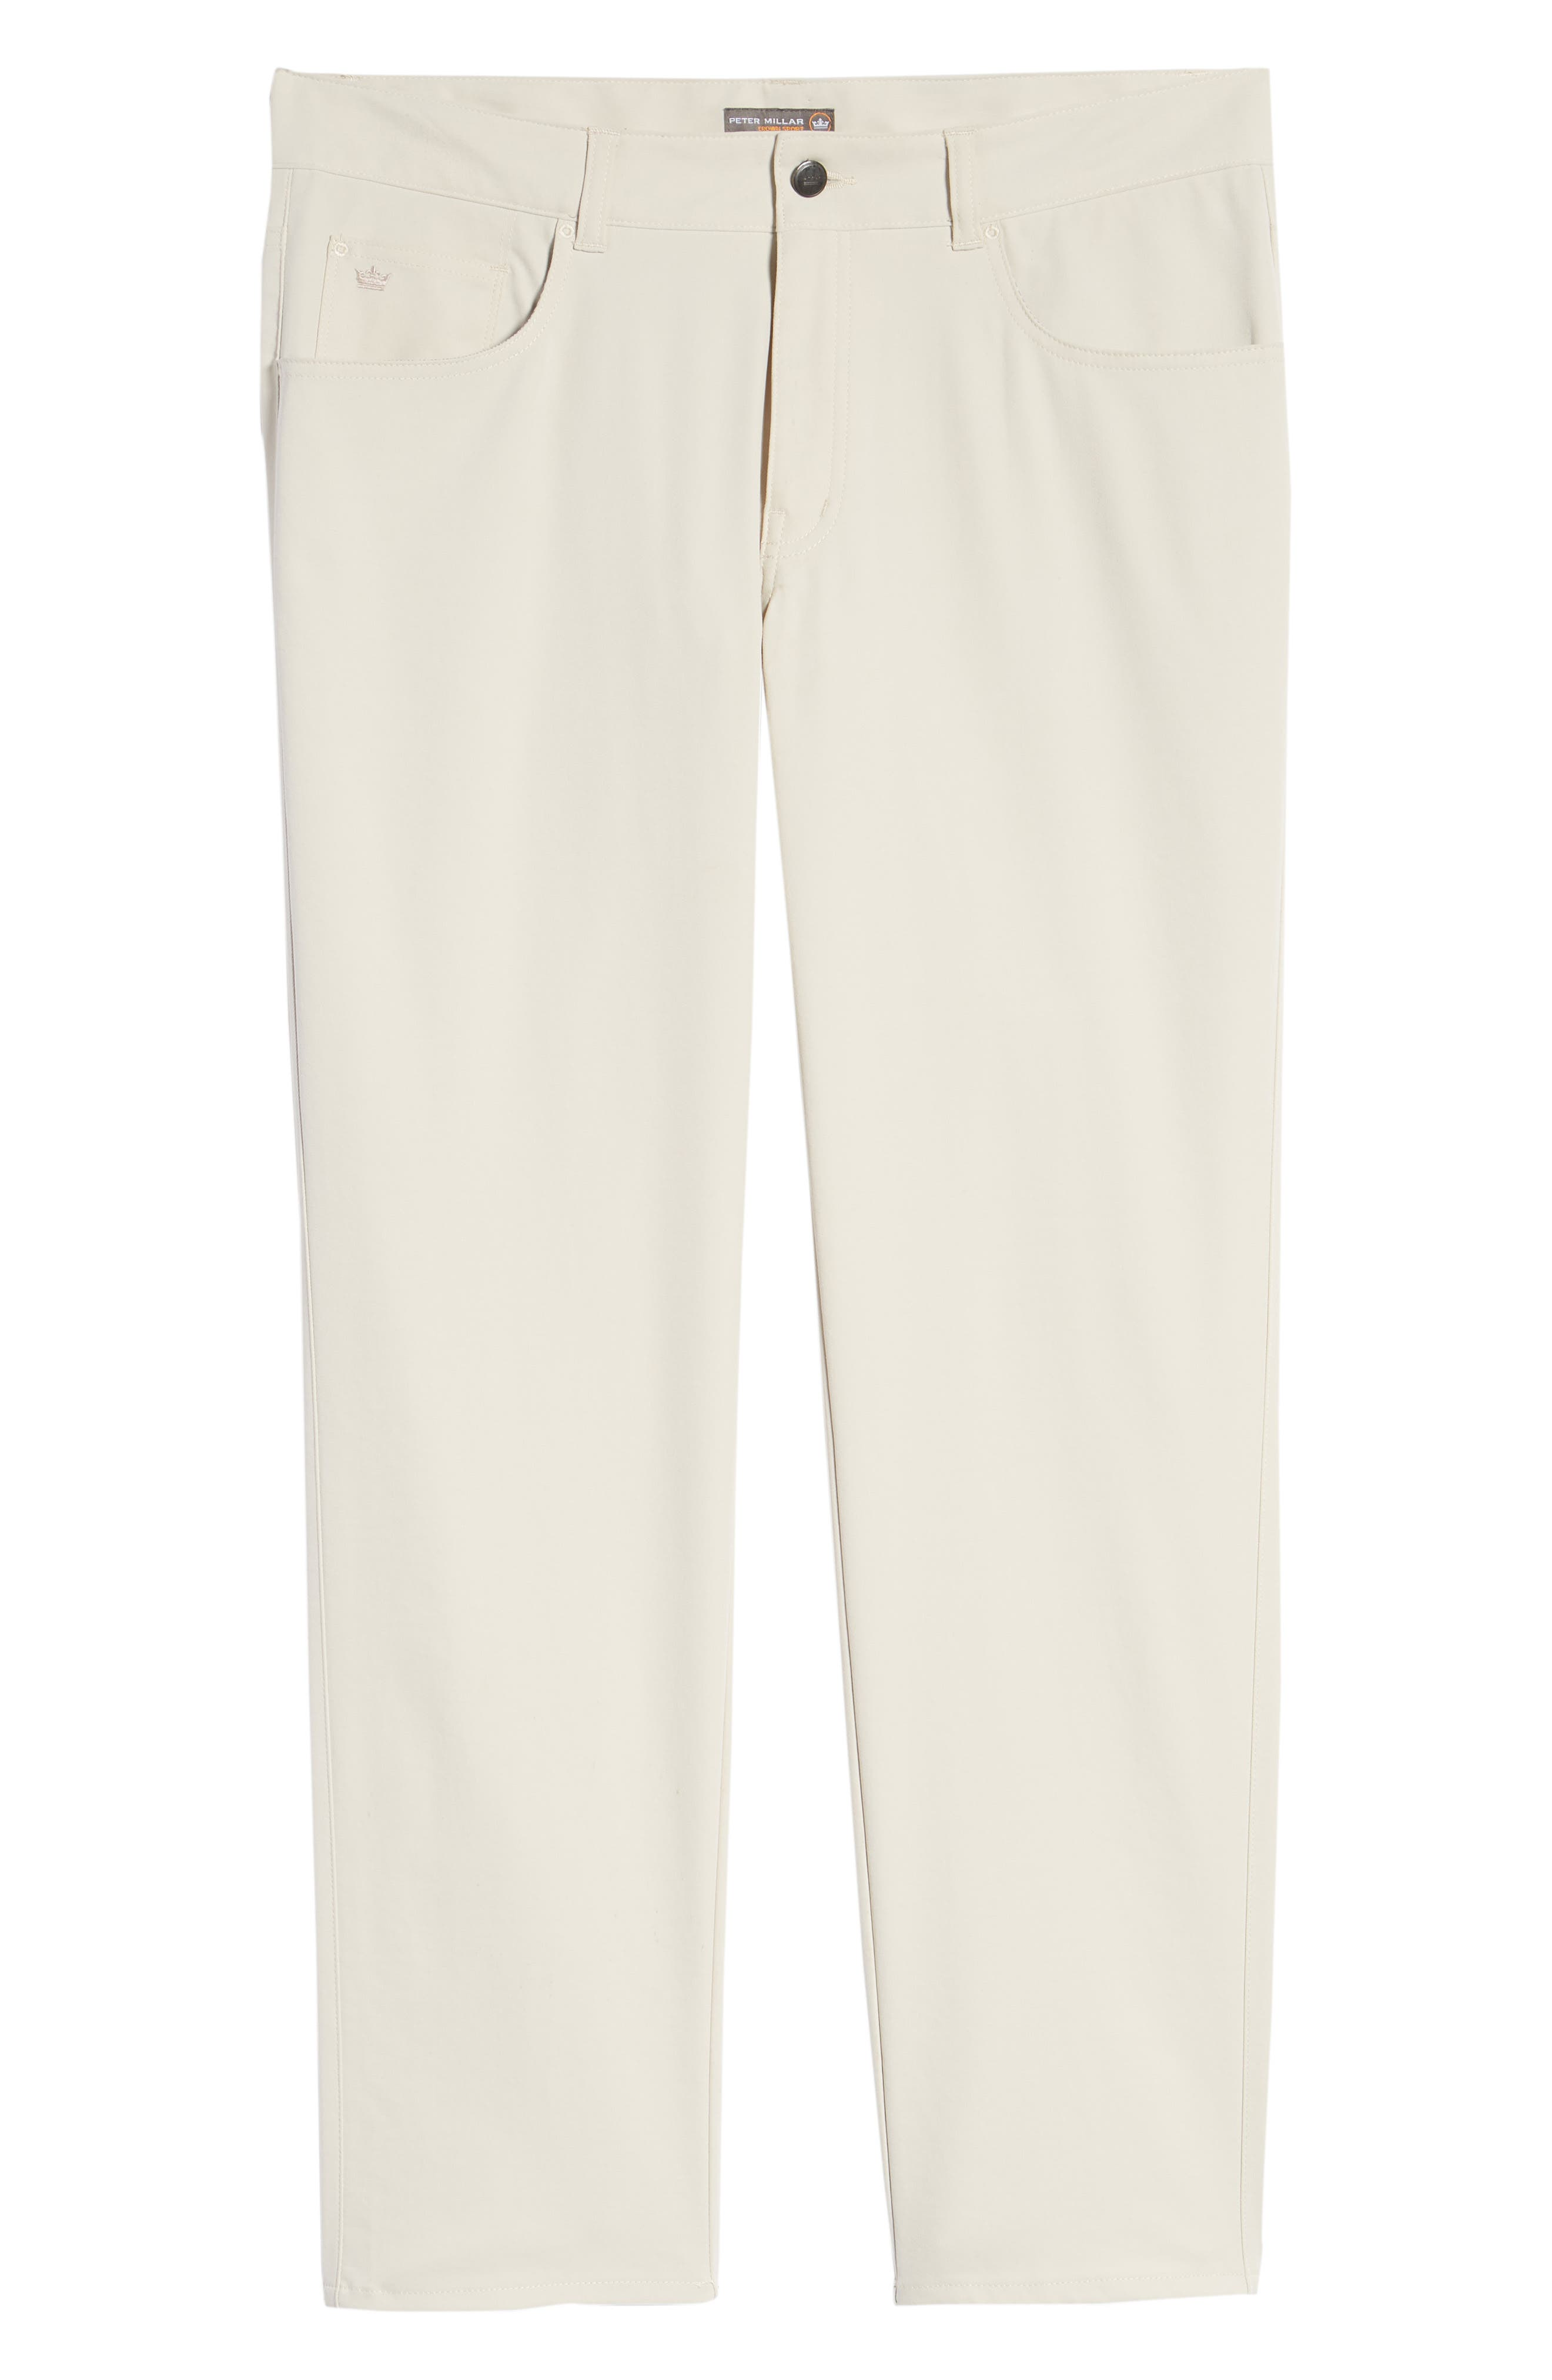 EB66 Performance Six-Pocket Pants,                             Alternate thumbnail 34, color,